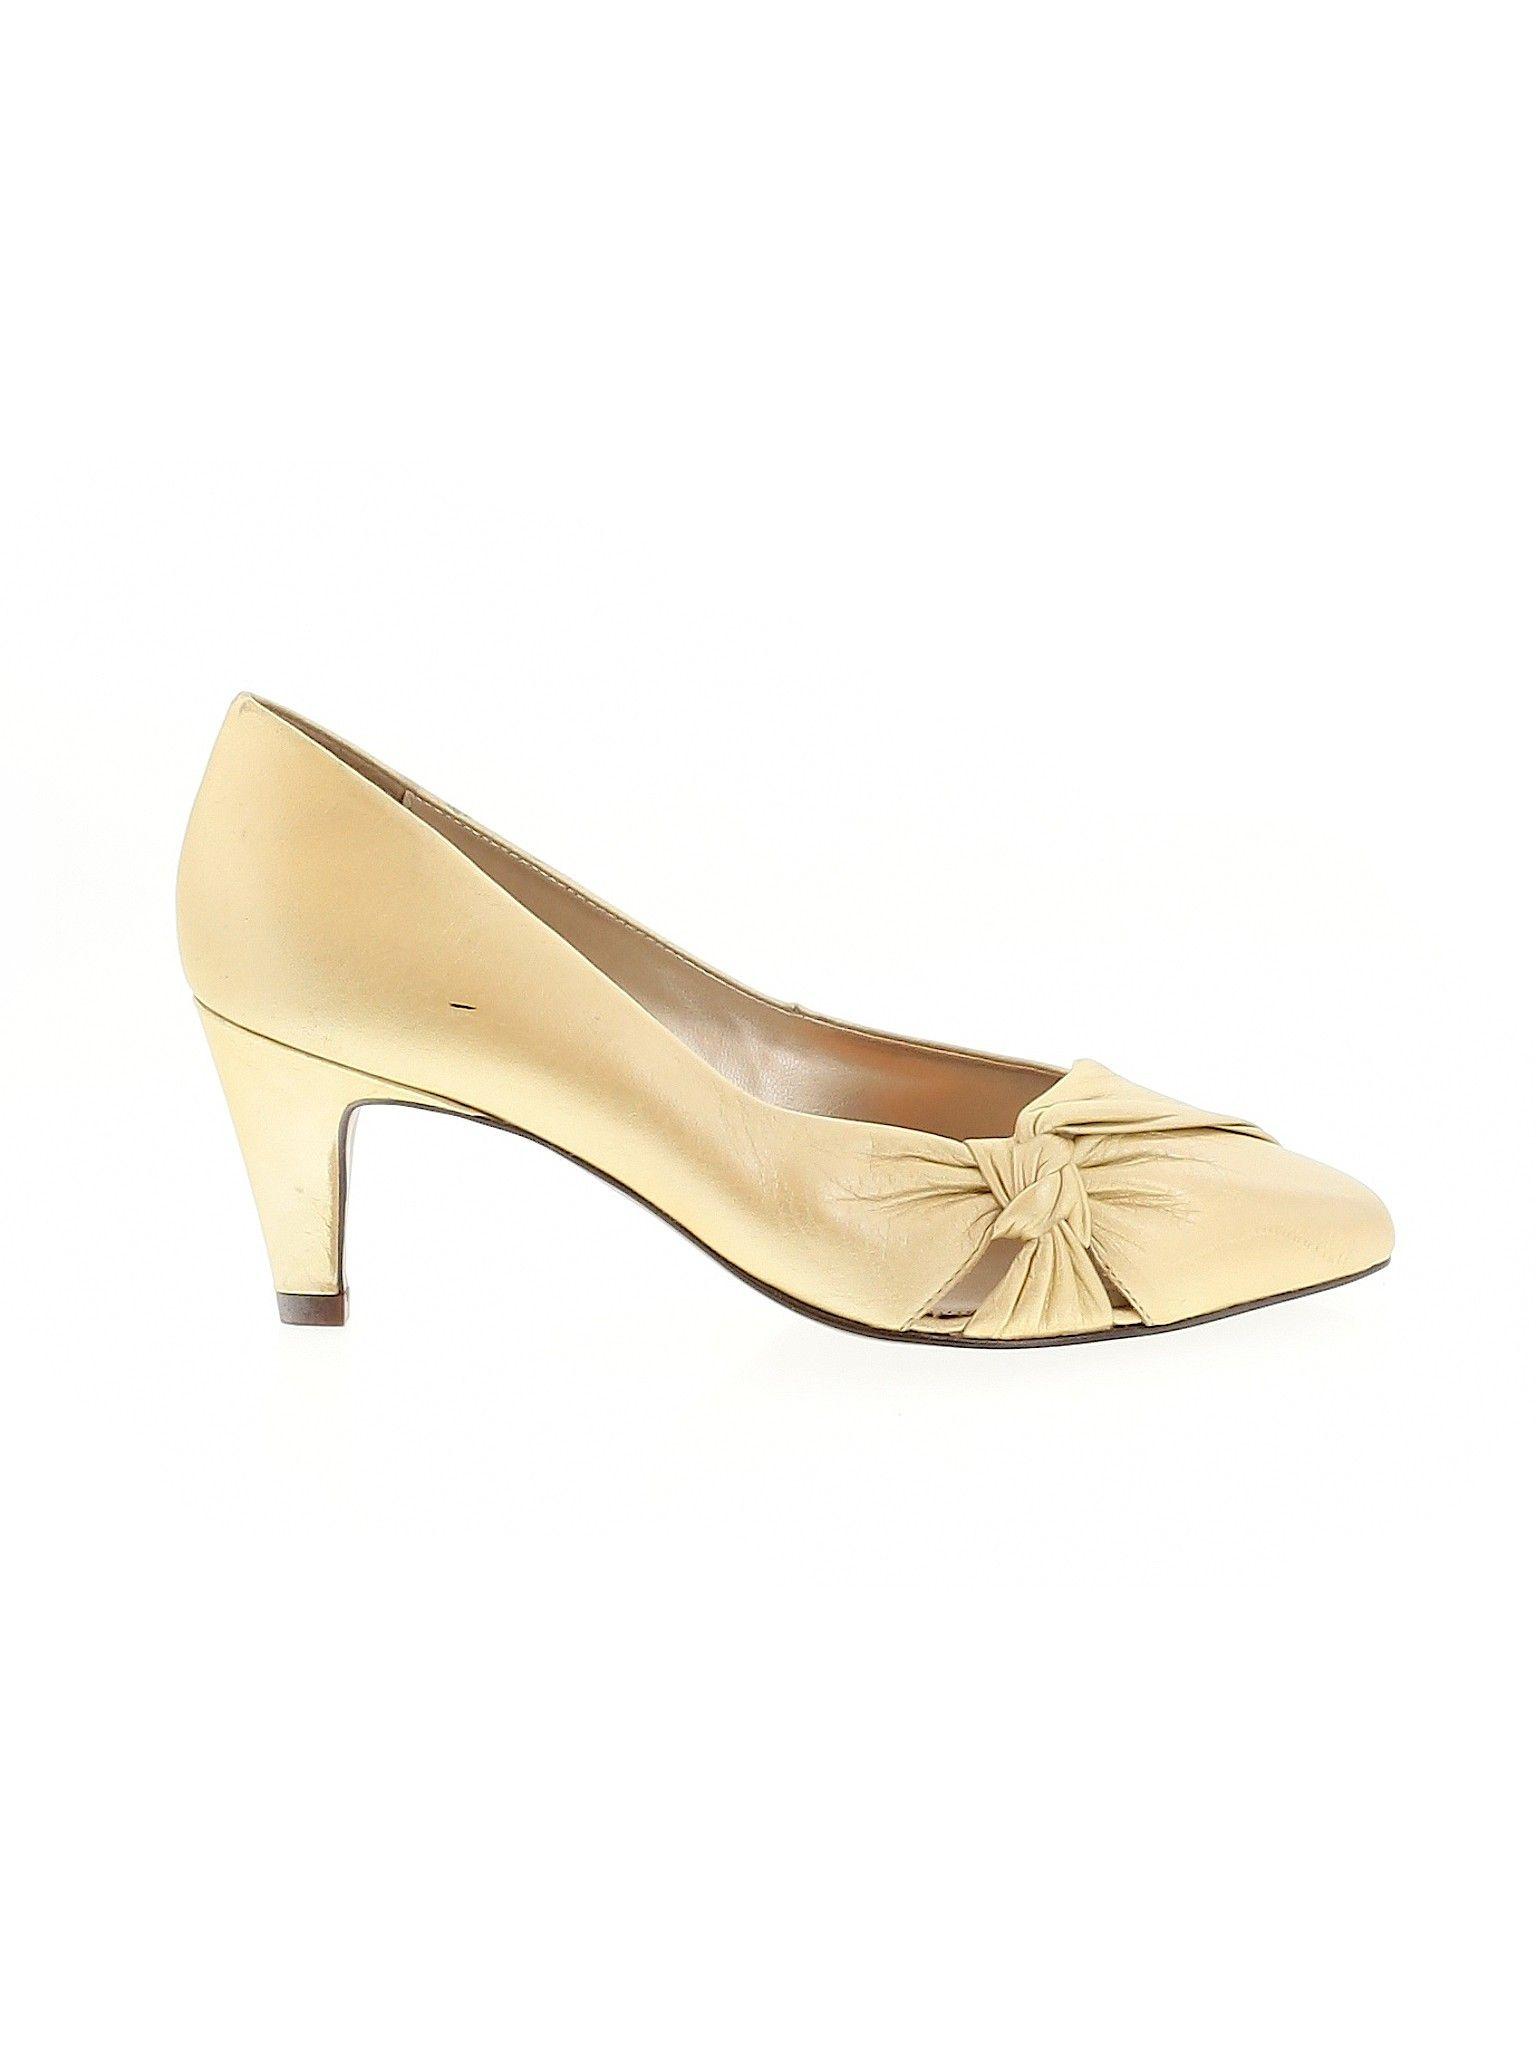 Connie Heel Gold Metallic Women S Shoes Size 6 Women Shoes